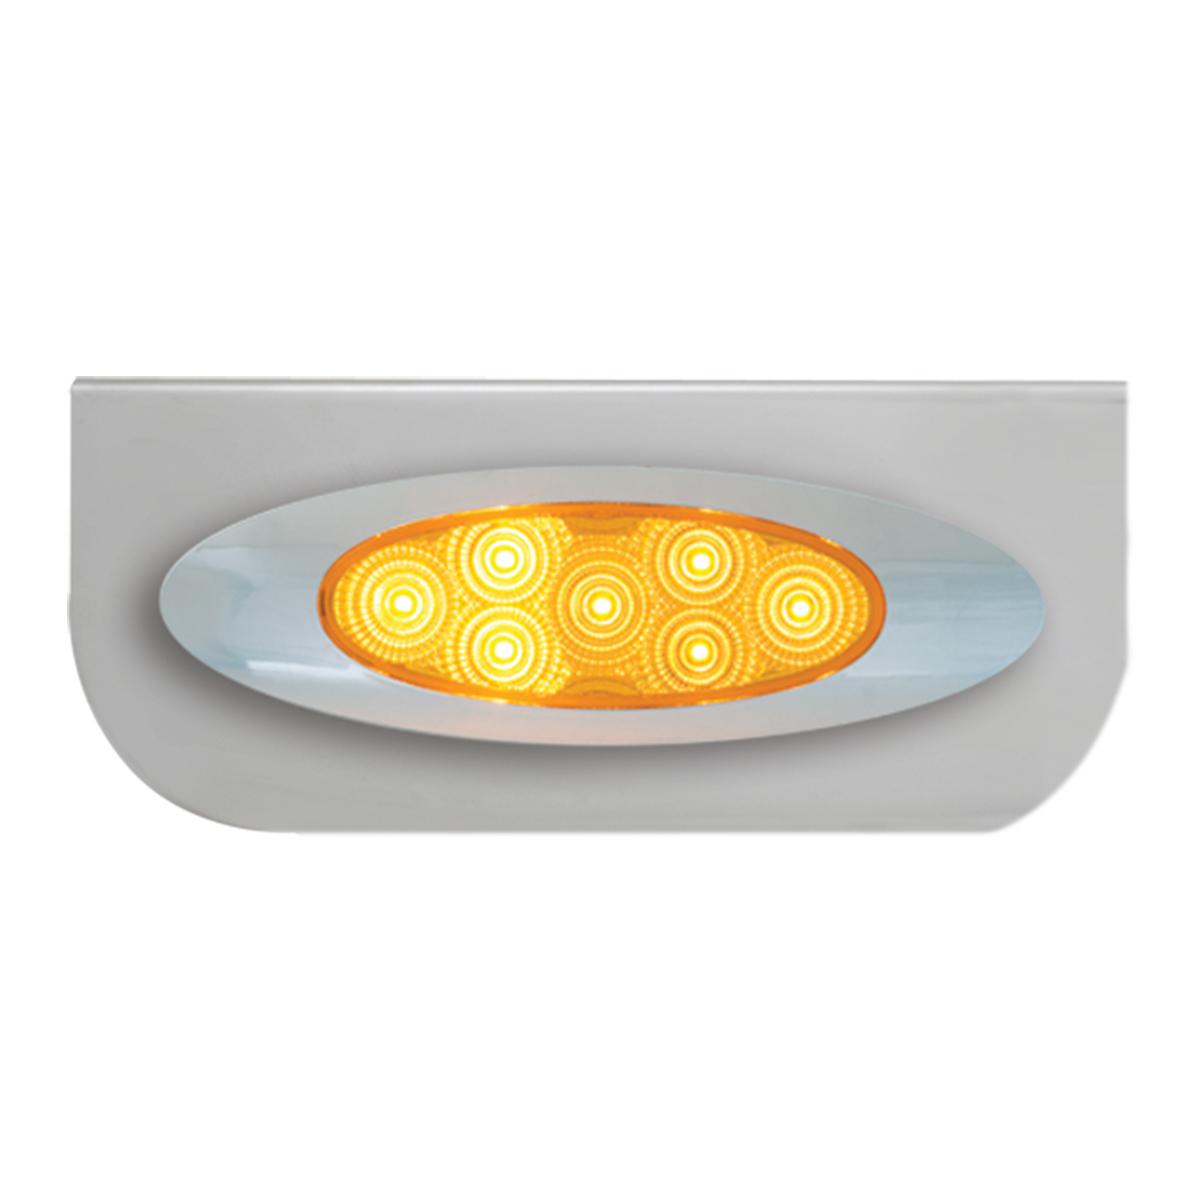 "#89026 Single Stainless Steel ""L"" Shape Light Bracket with Plug-In Y2K Spyder LED Lights"